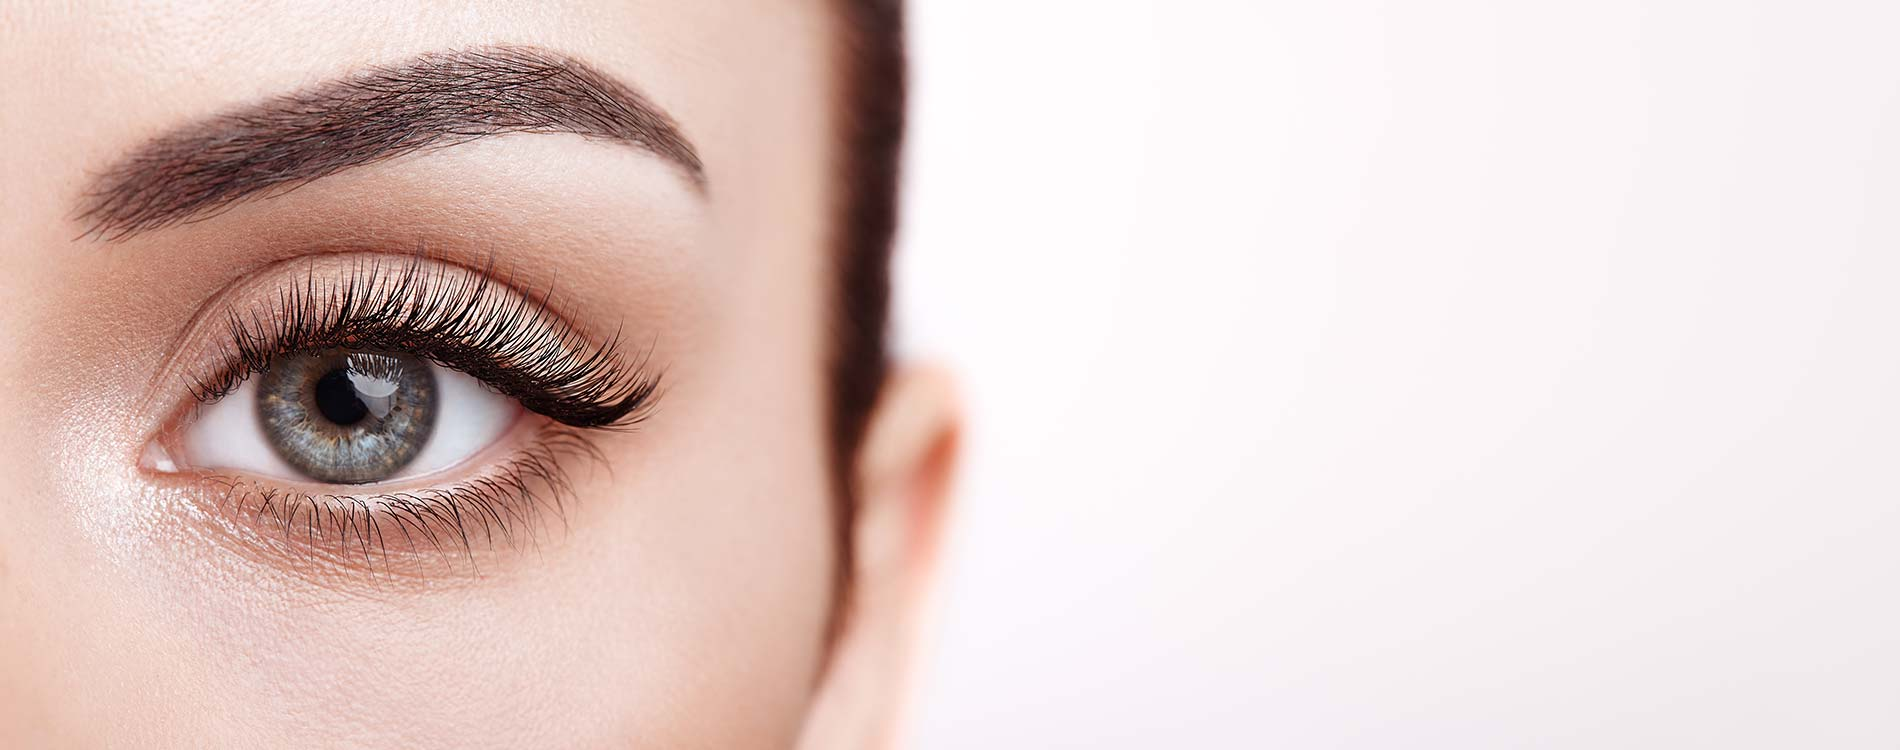 Naturwimpernlifting Wimpernextensions prospa kosmetik imst kosmetikstudio